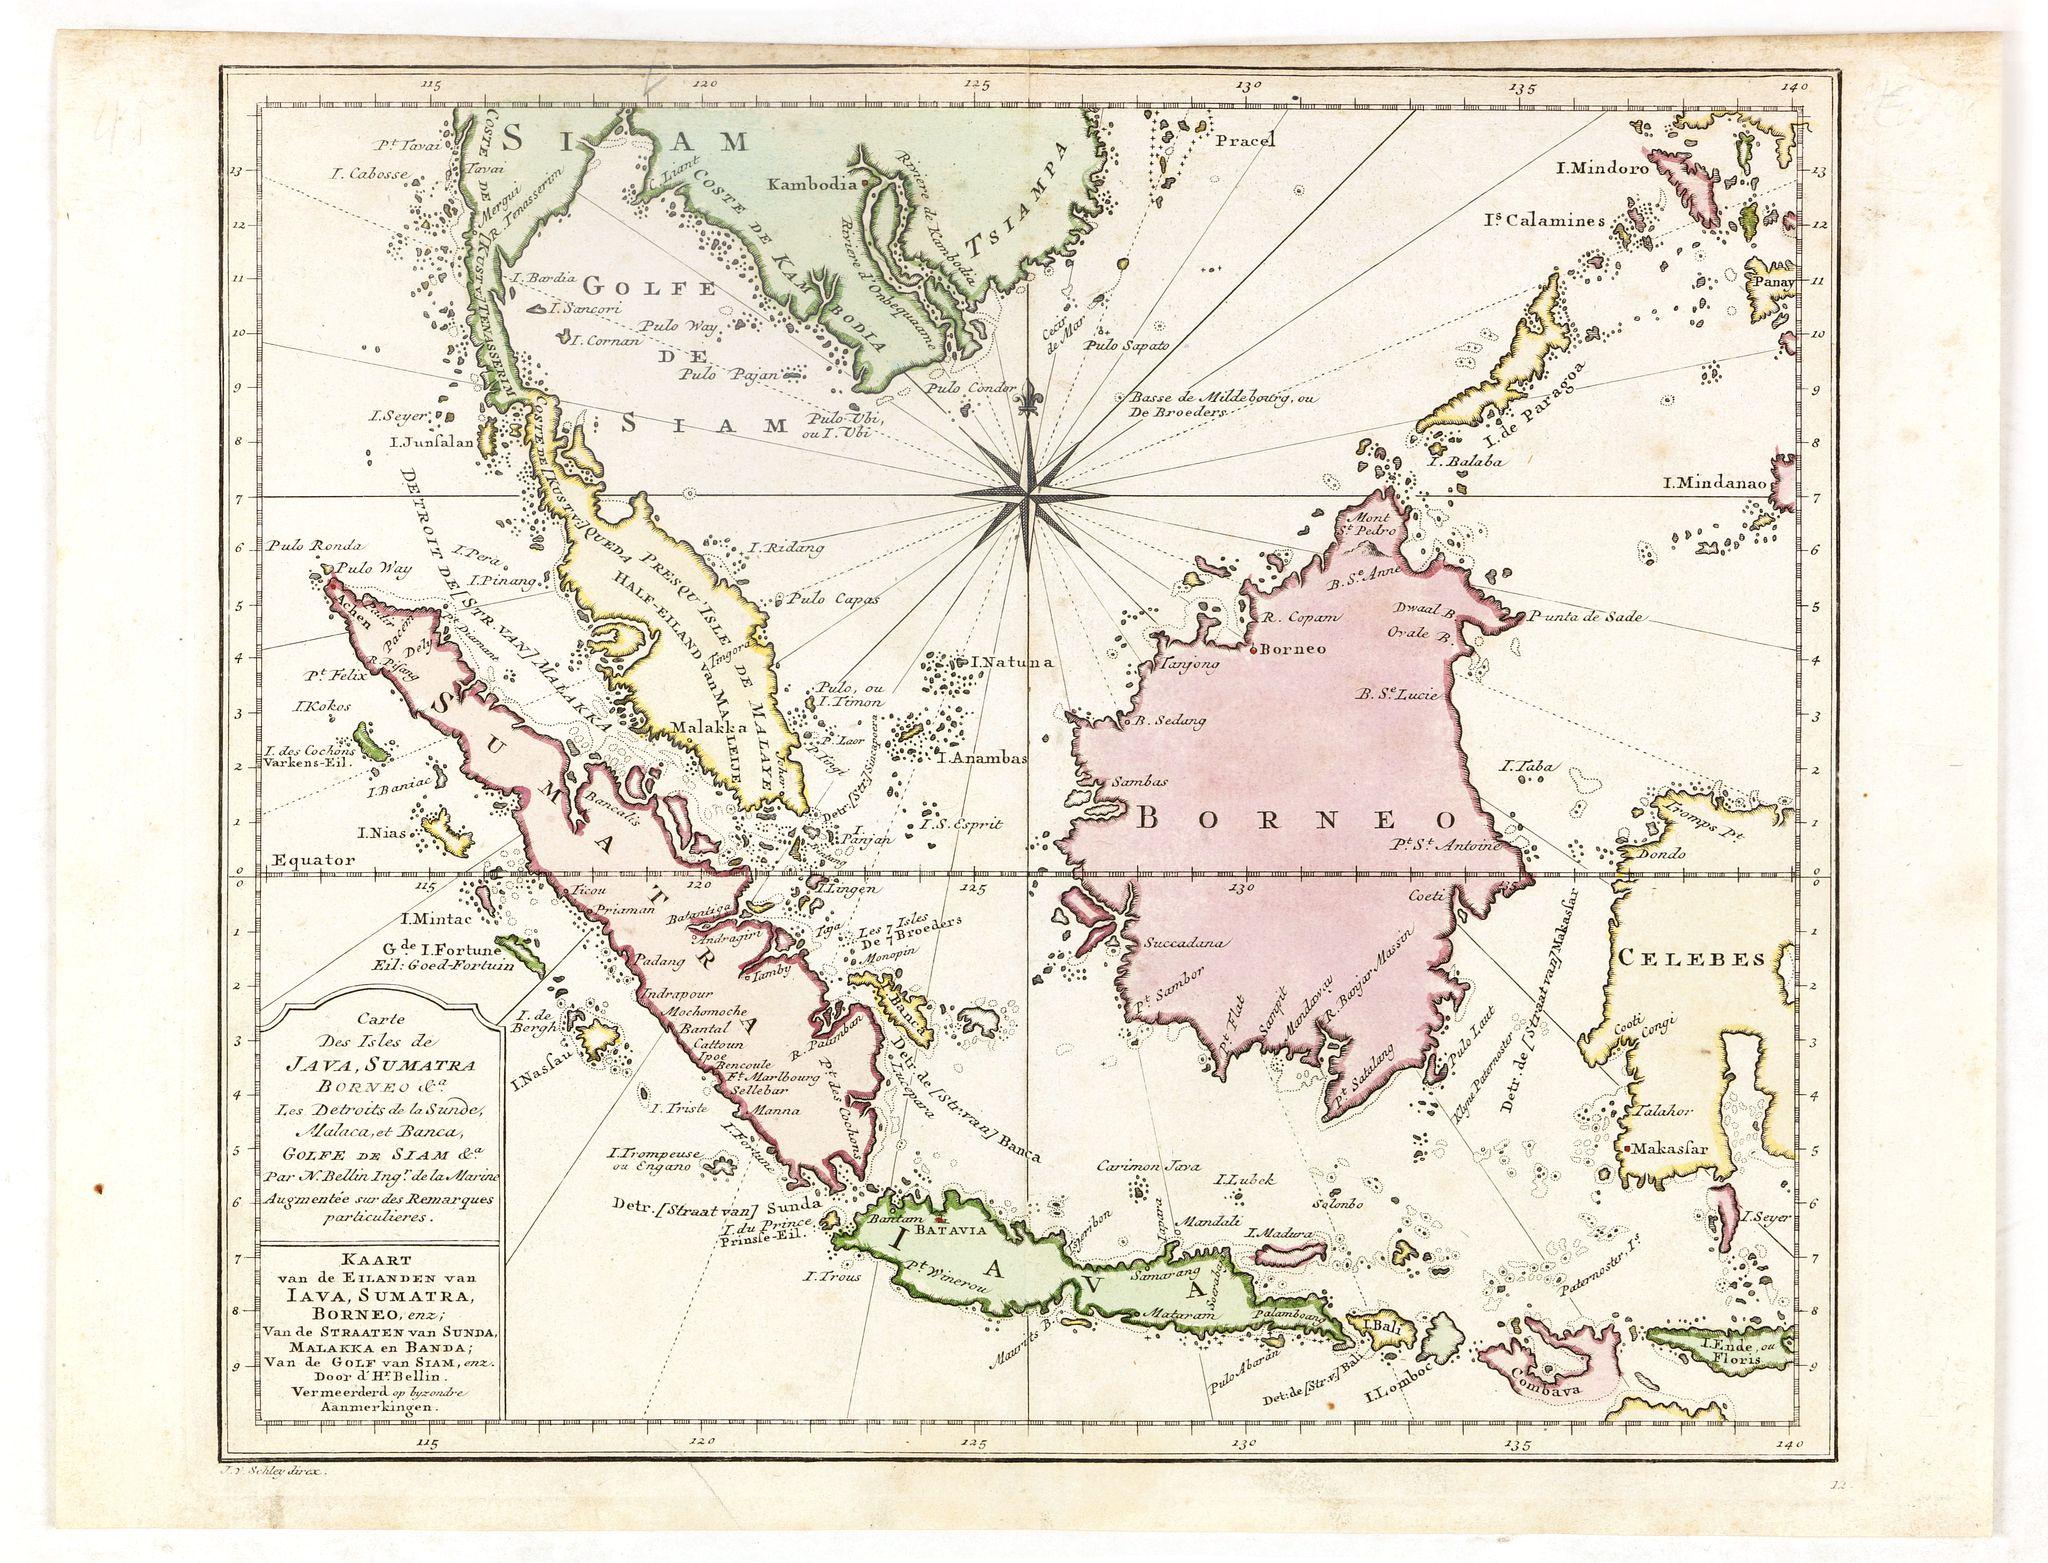 BELLIN, J.N. -  Carte des Isles de Java, Sumatra, Borneo. . . Malaca et Banca. . . / Kaart van de Eilanden van Java. . .